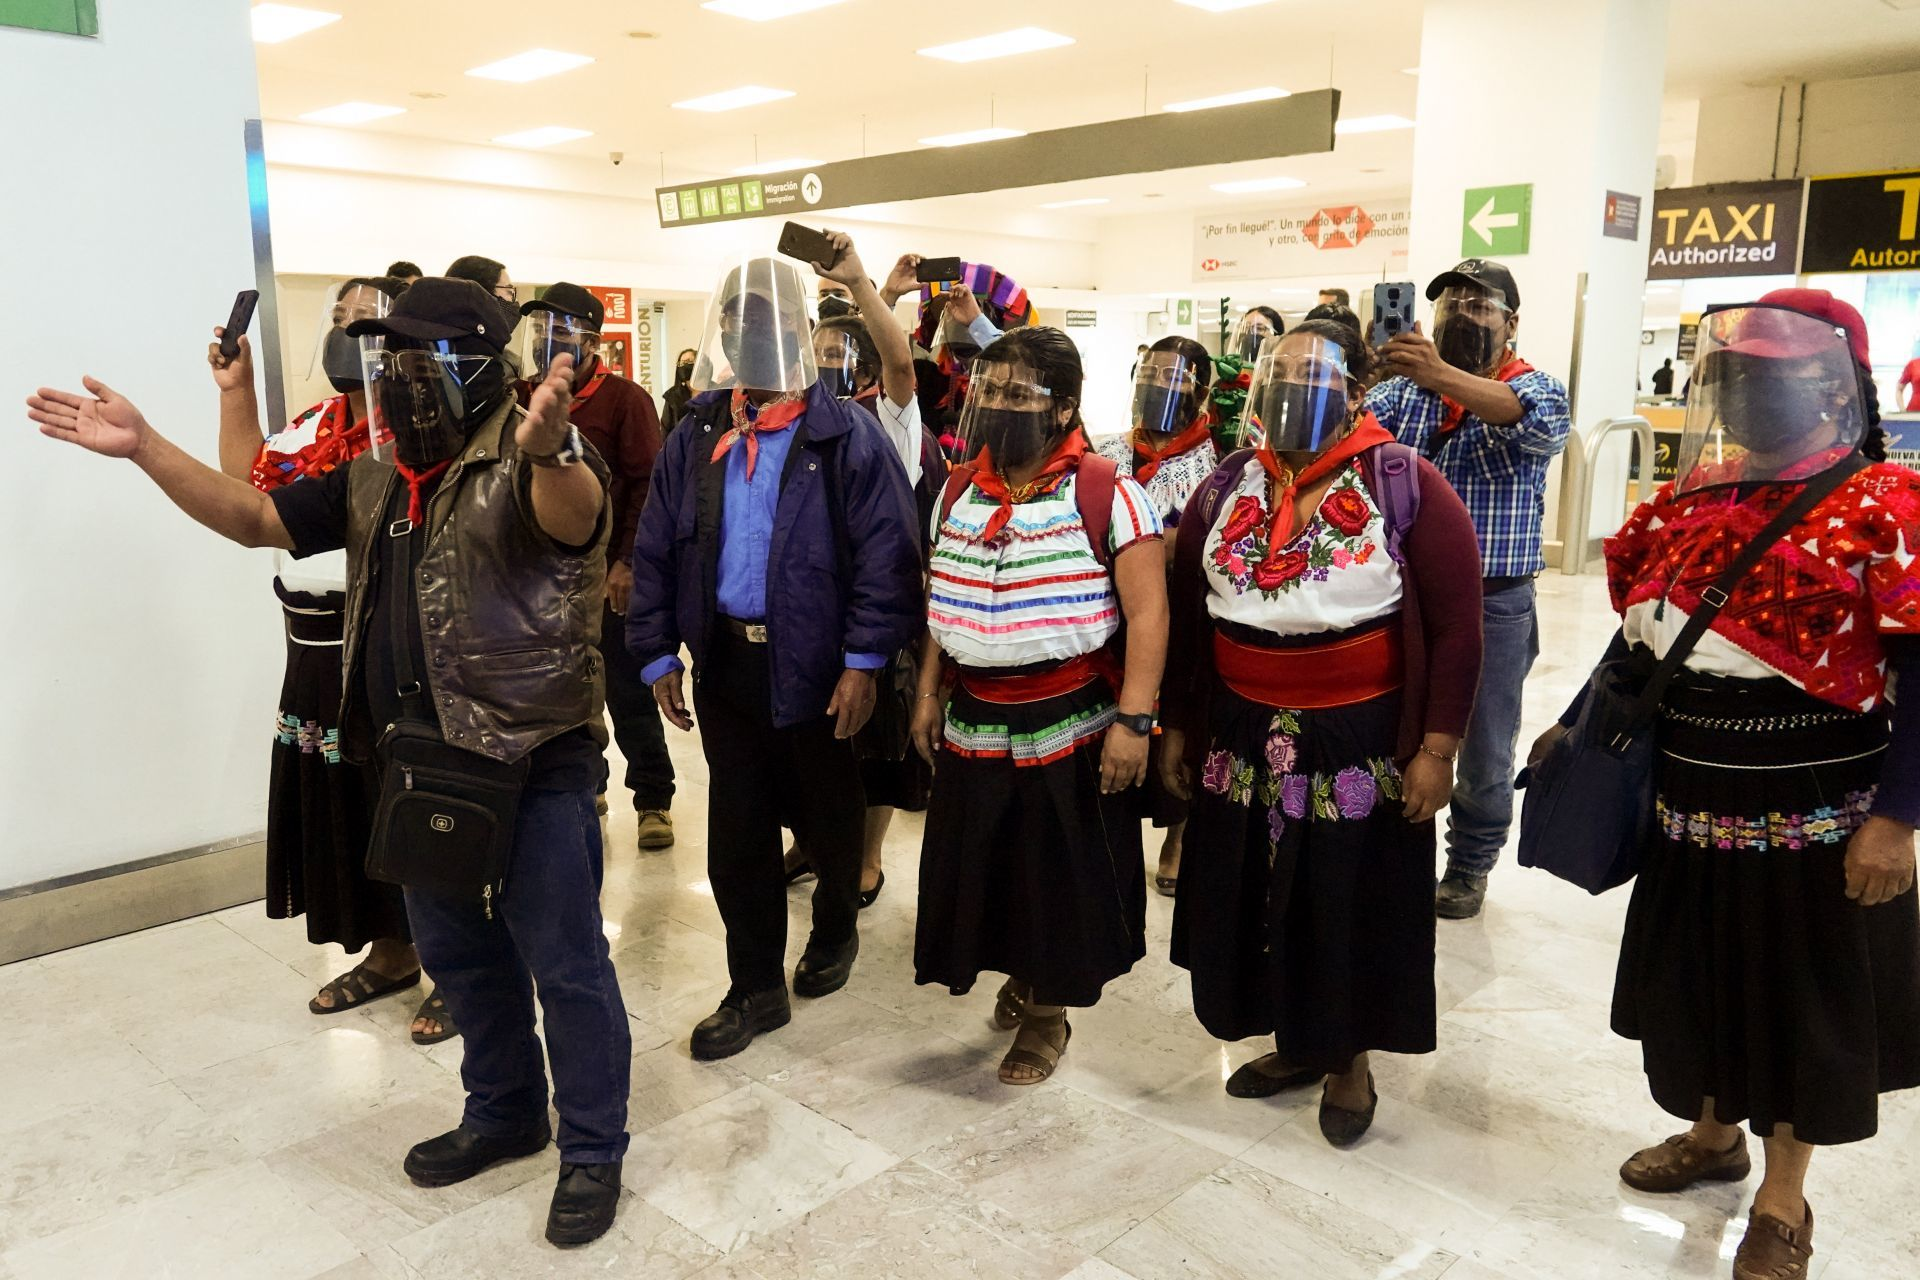 Regresa a México delegación del EZLN tras visitar 30 países de Europa